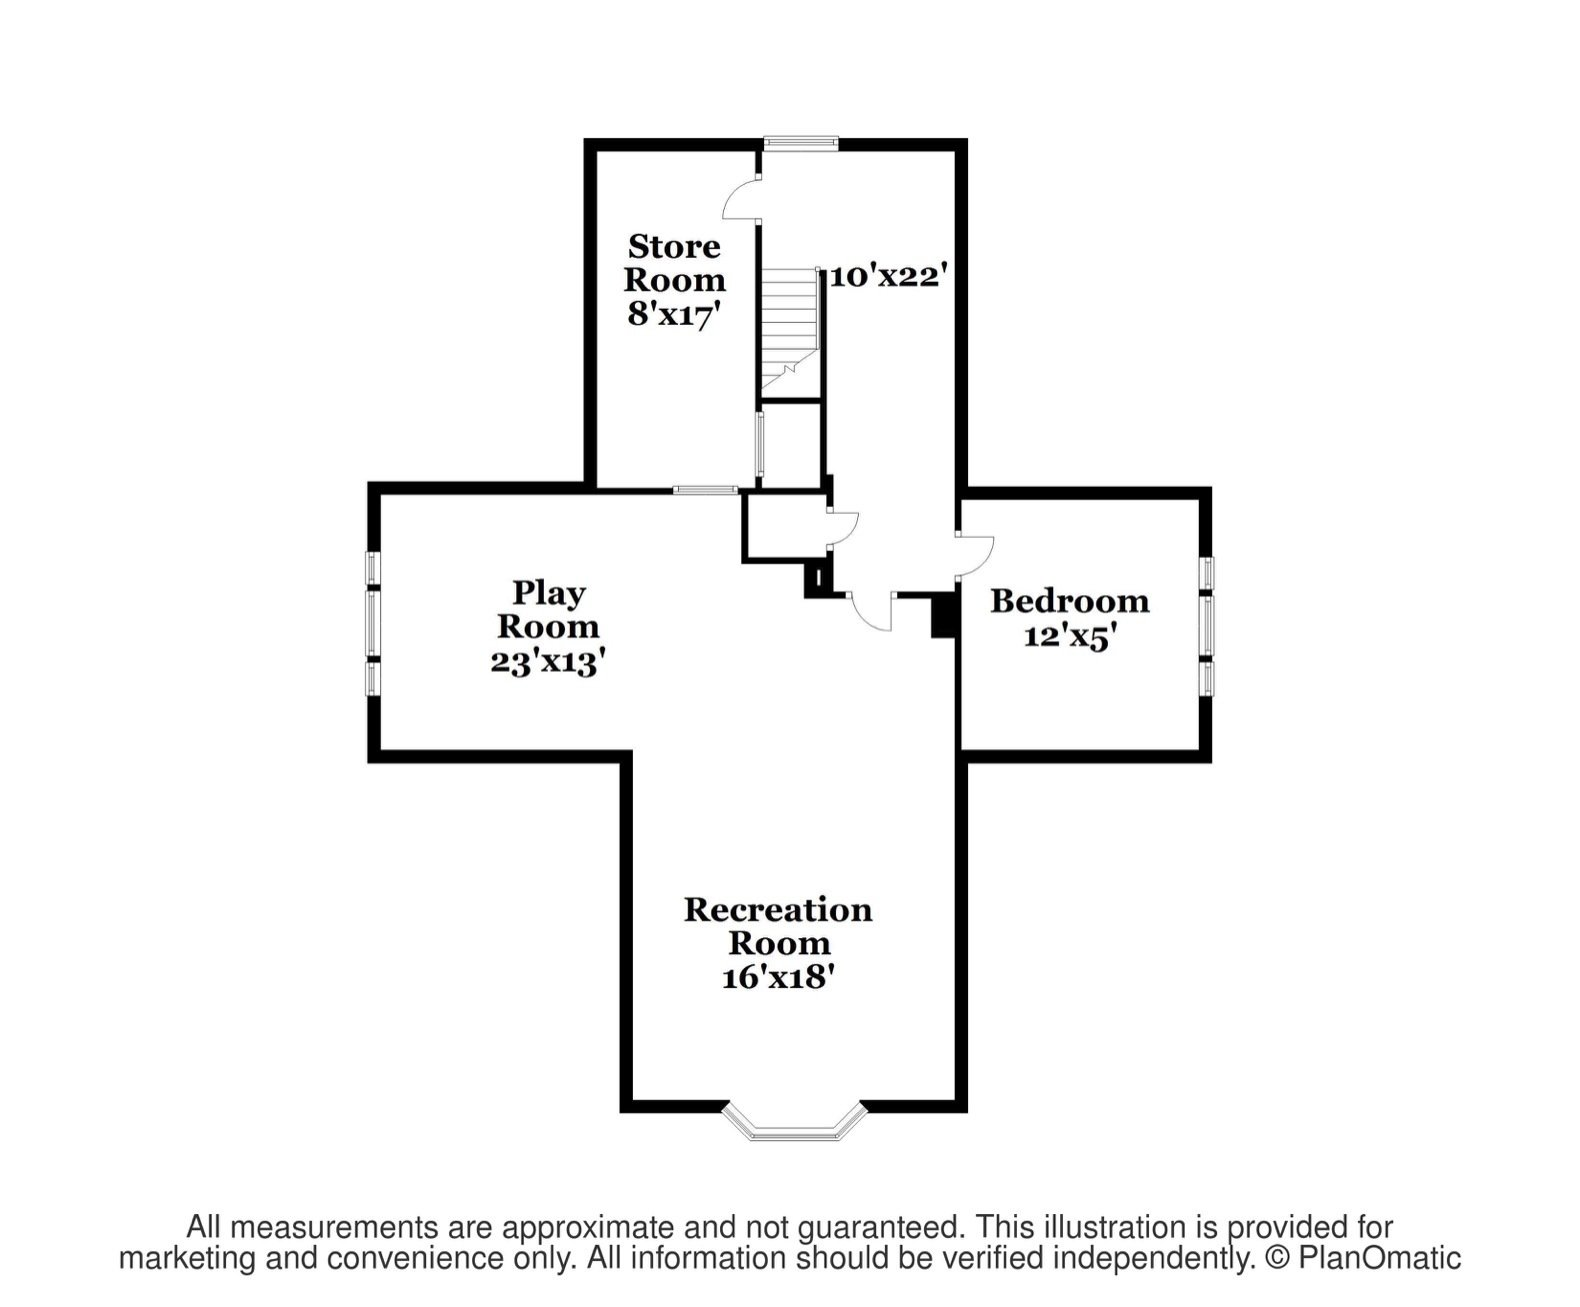 W. Irving Clark House third floor plan